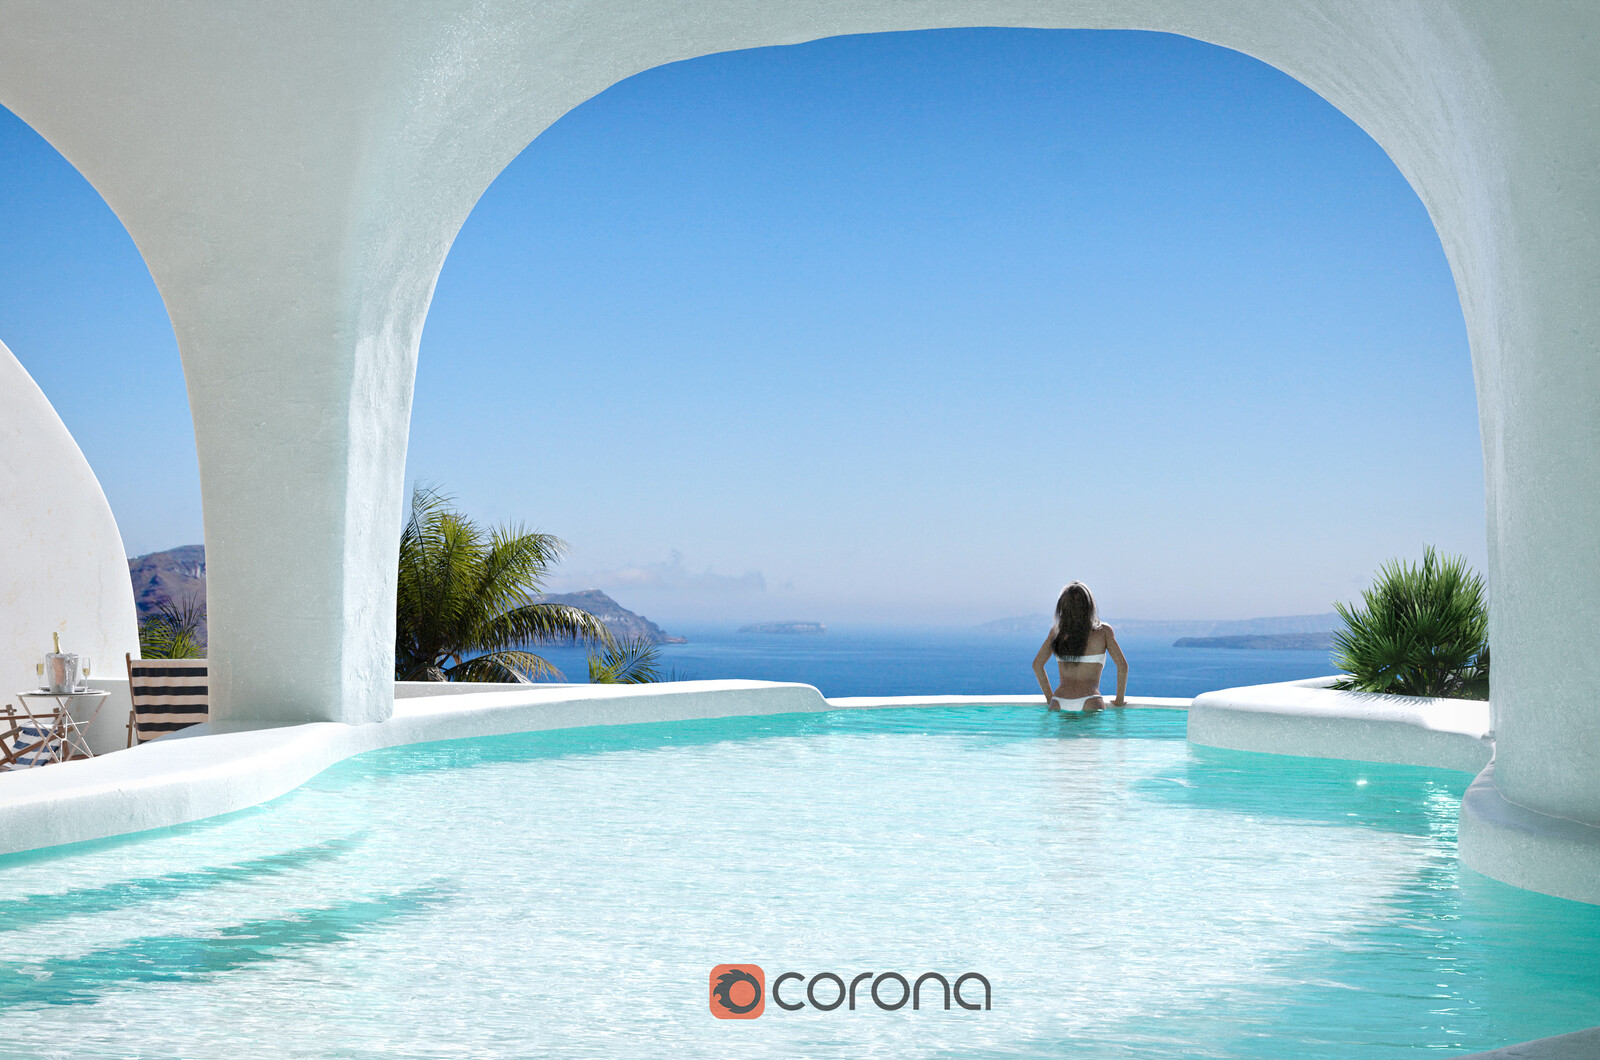 Santorini - Corona Renderer